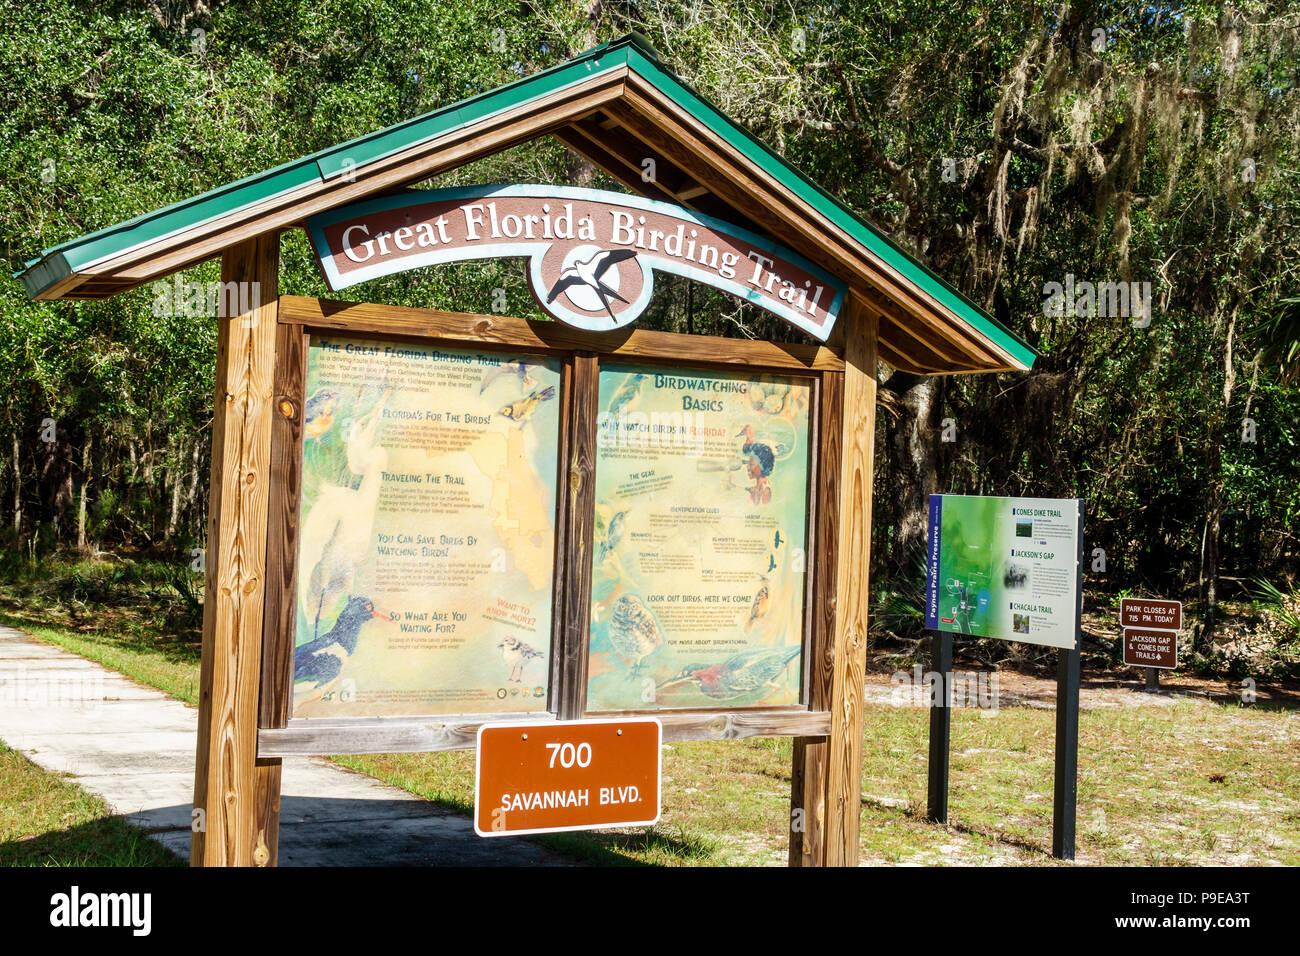 Florida Gainesville Micanopy Paynes Prairie Ecopassage Nature Preserve State Park birding trail kiosk National Natural Landmark conservation interpret - Stock Image